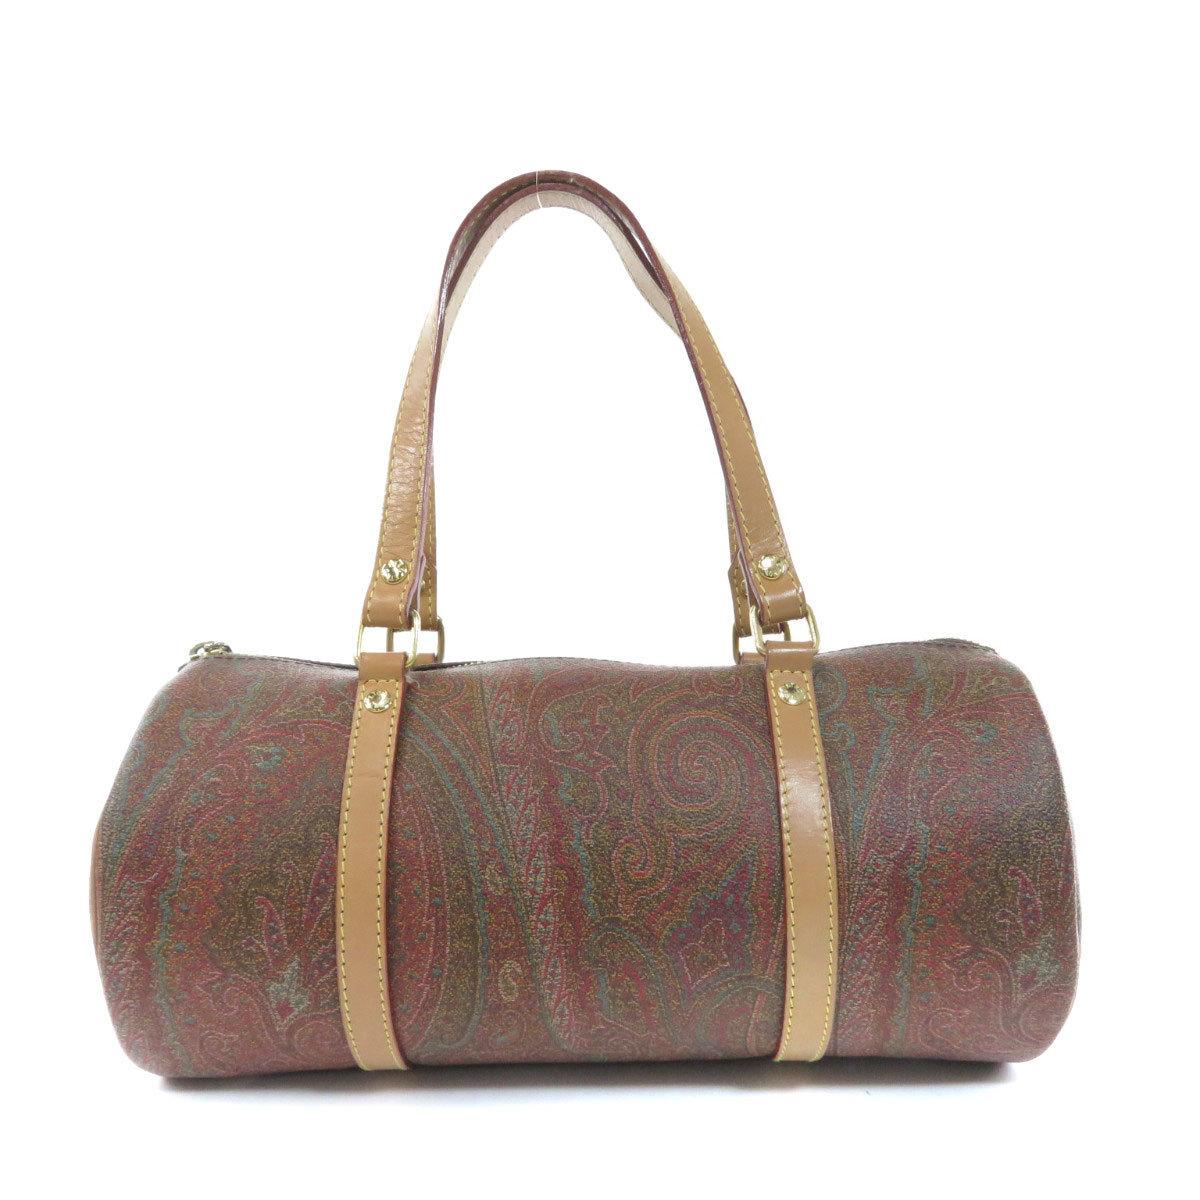 Etro Paisley Handbag PVC Ladies